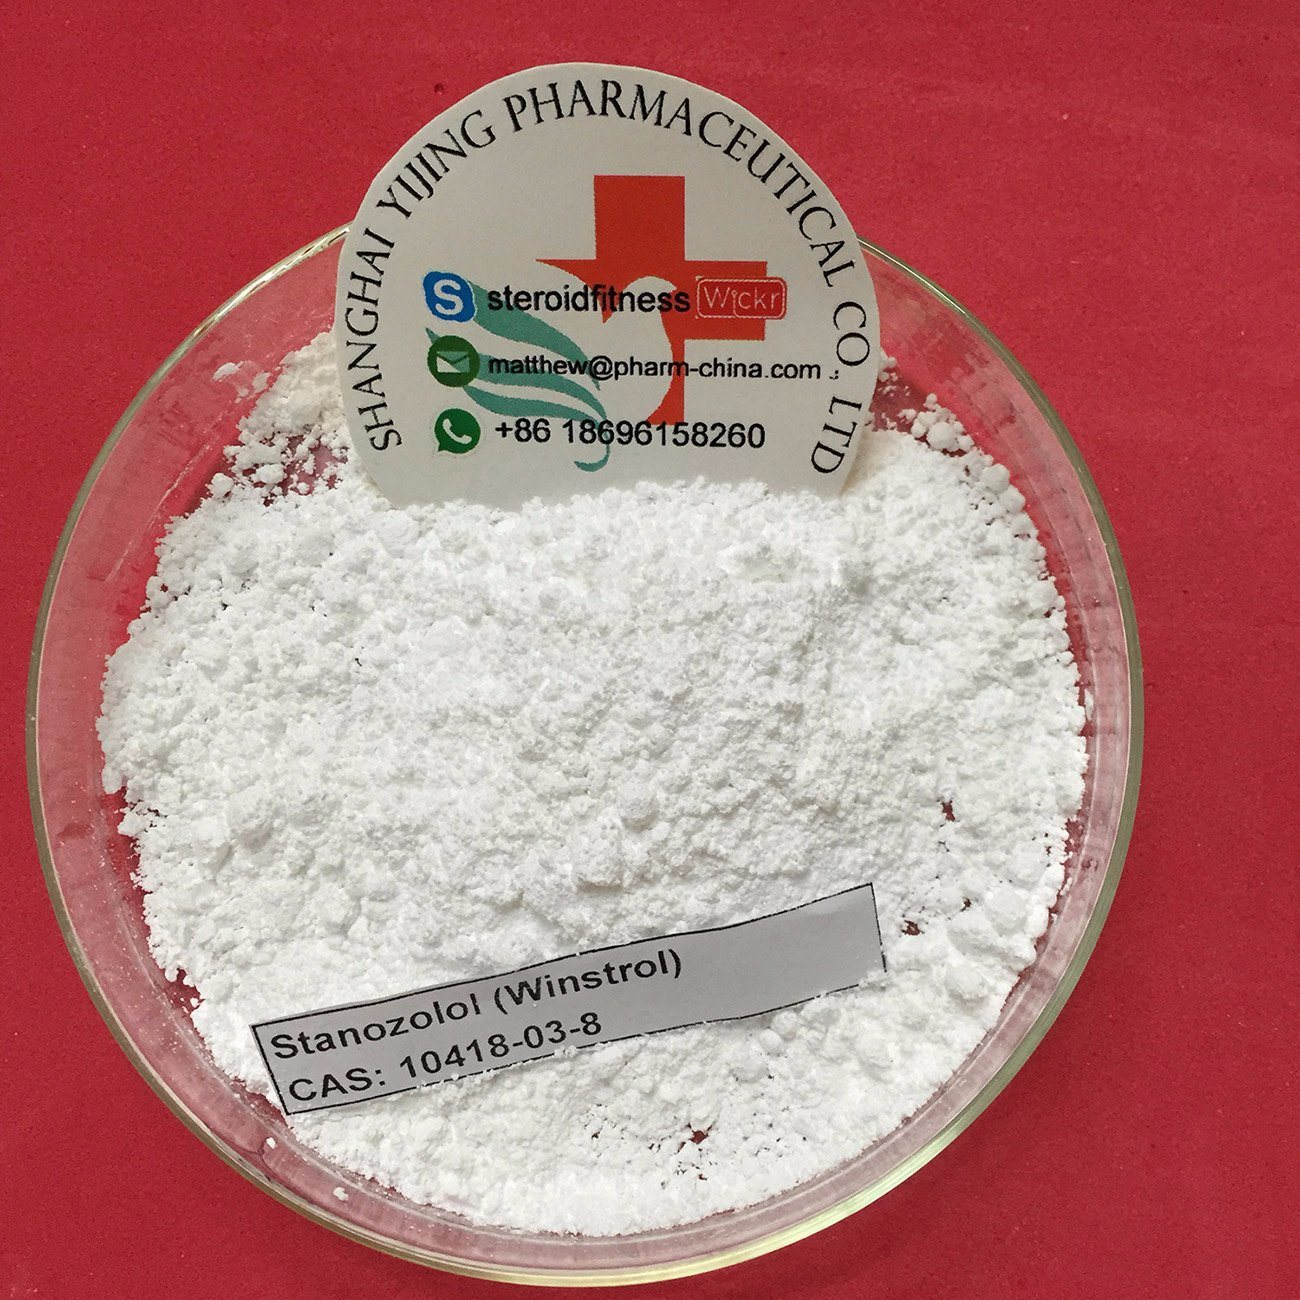 Oral Steroid Powder Winstrol/Winny/Stanz CAS: 10418-03-8